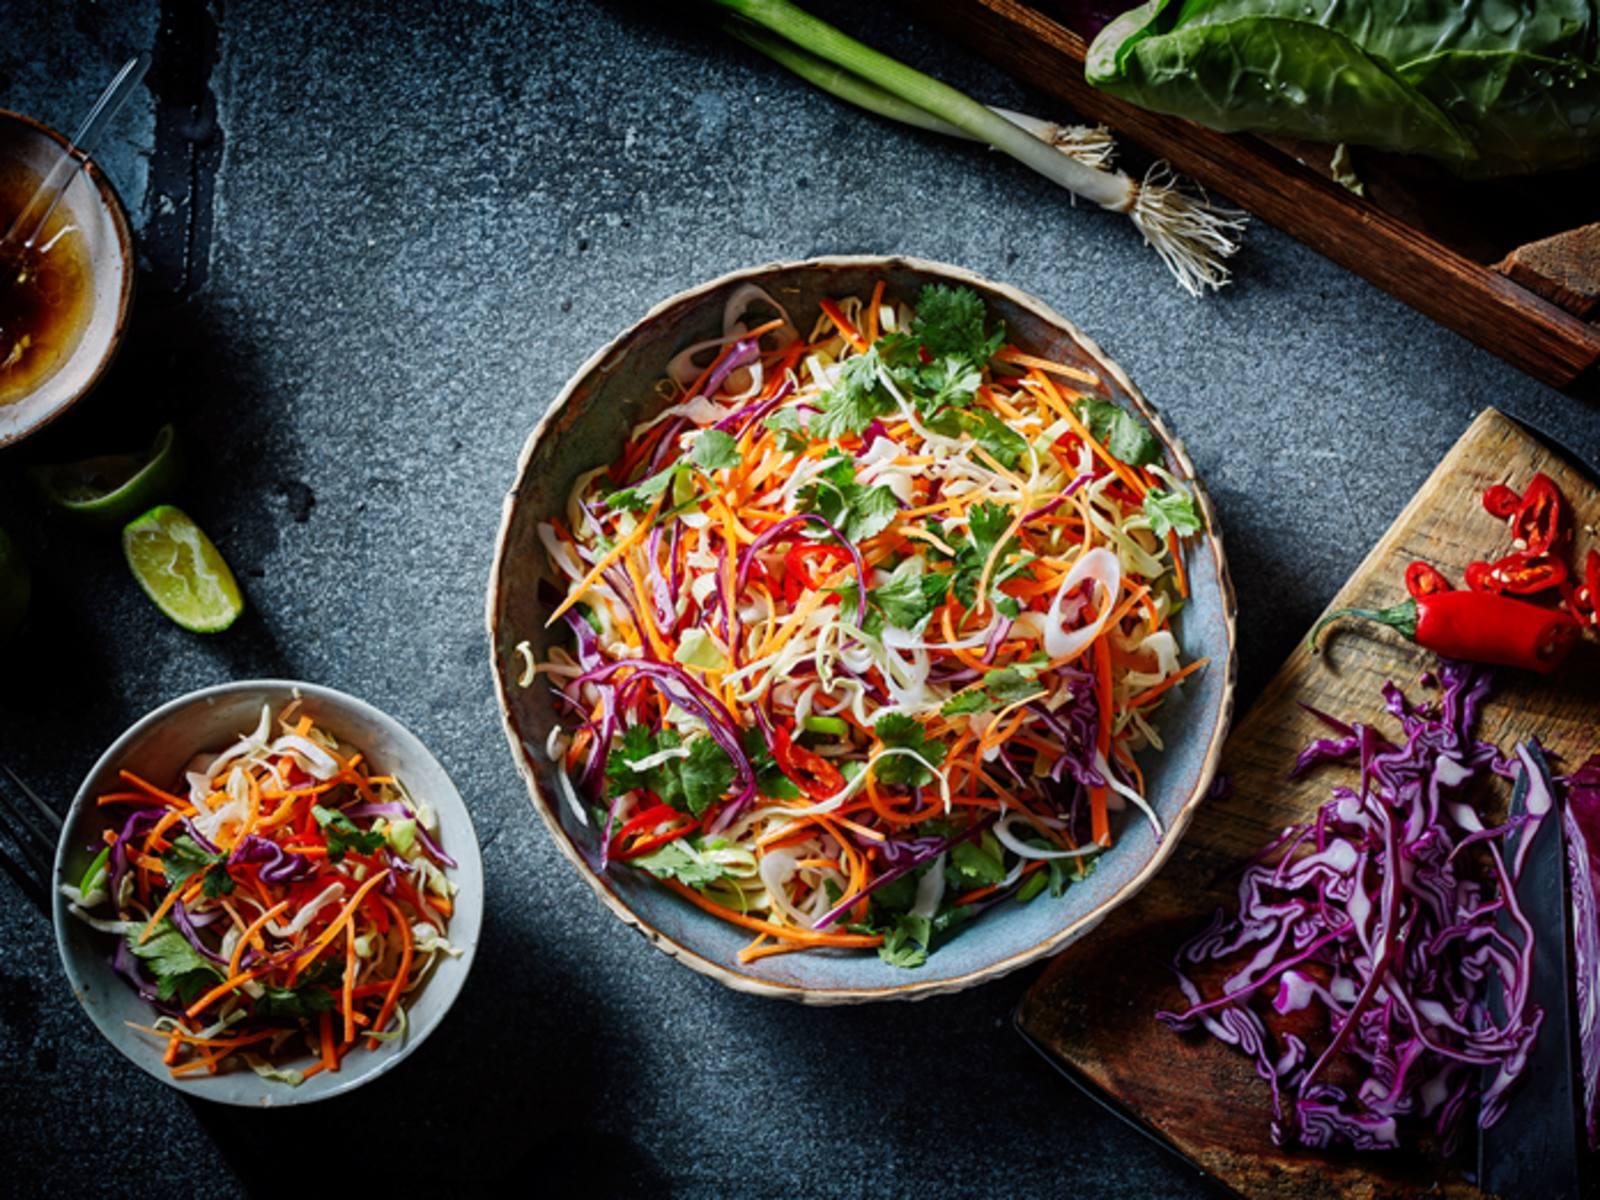 Thaise koolsalade